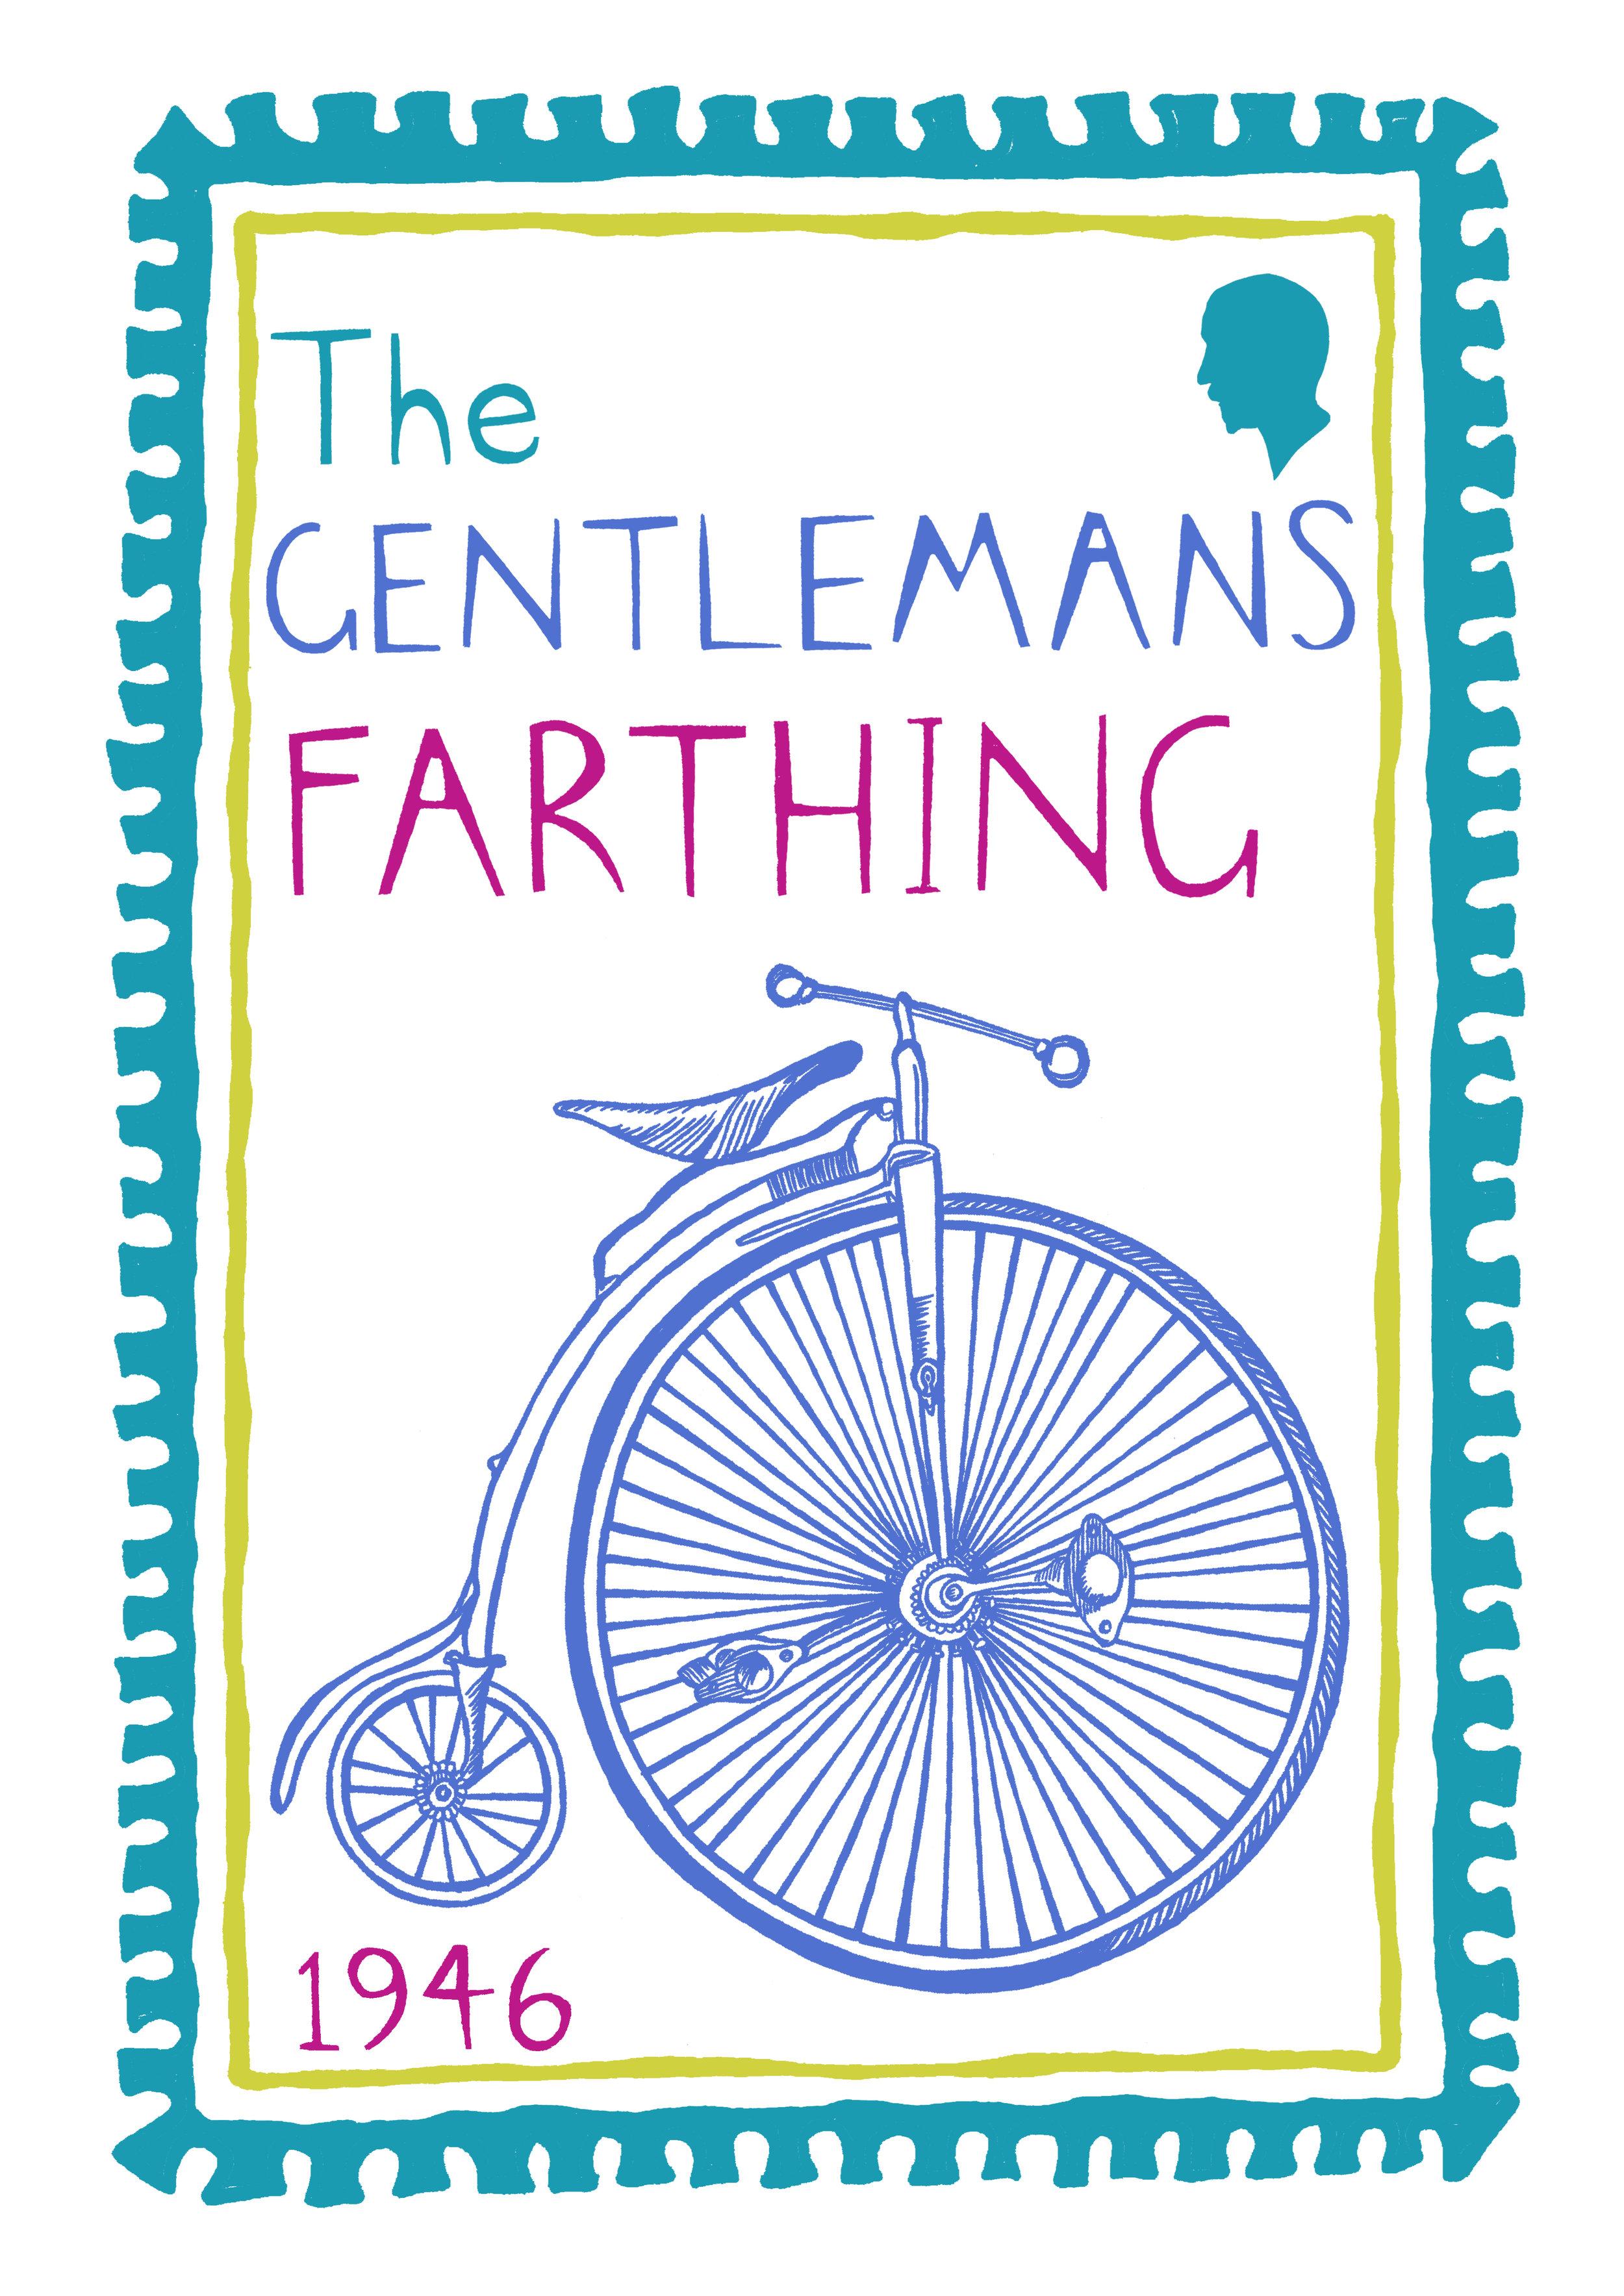 Penny Farthing Stamp.jpg